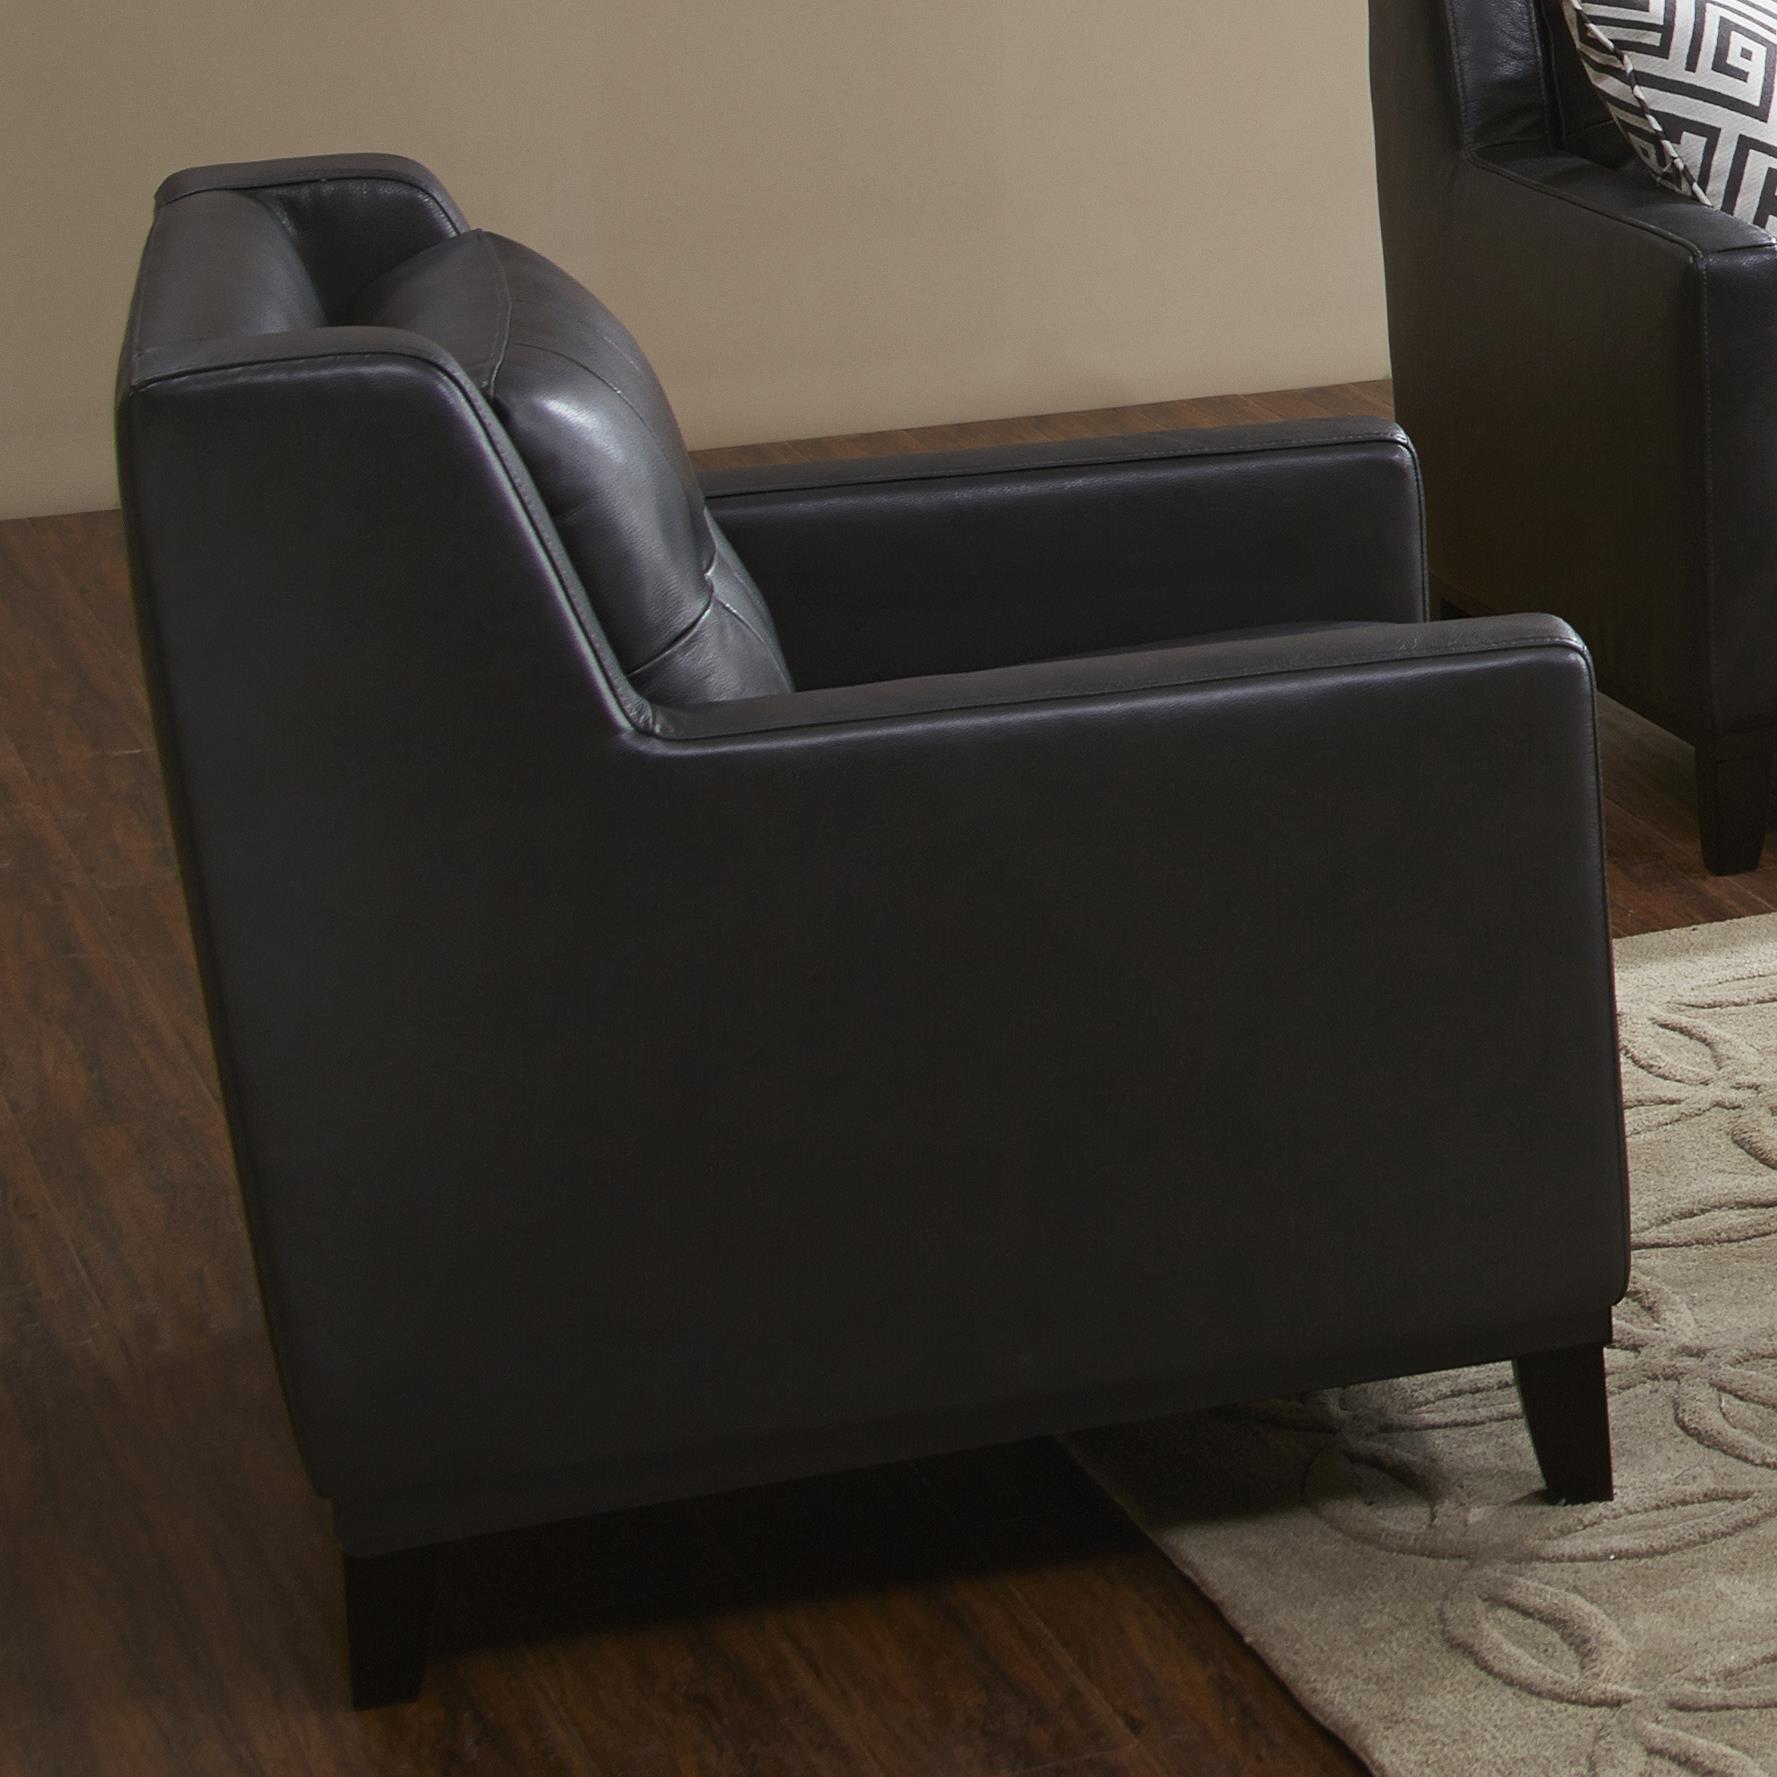 Urban Evolution Devon Chair - Item Number: 1838BC-M1215-L066